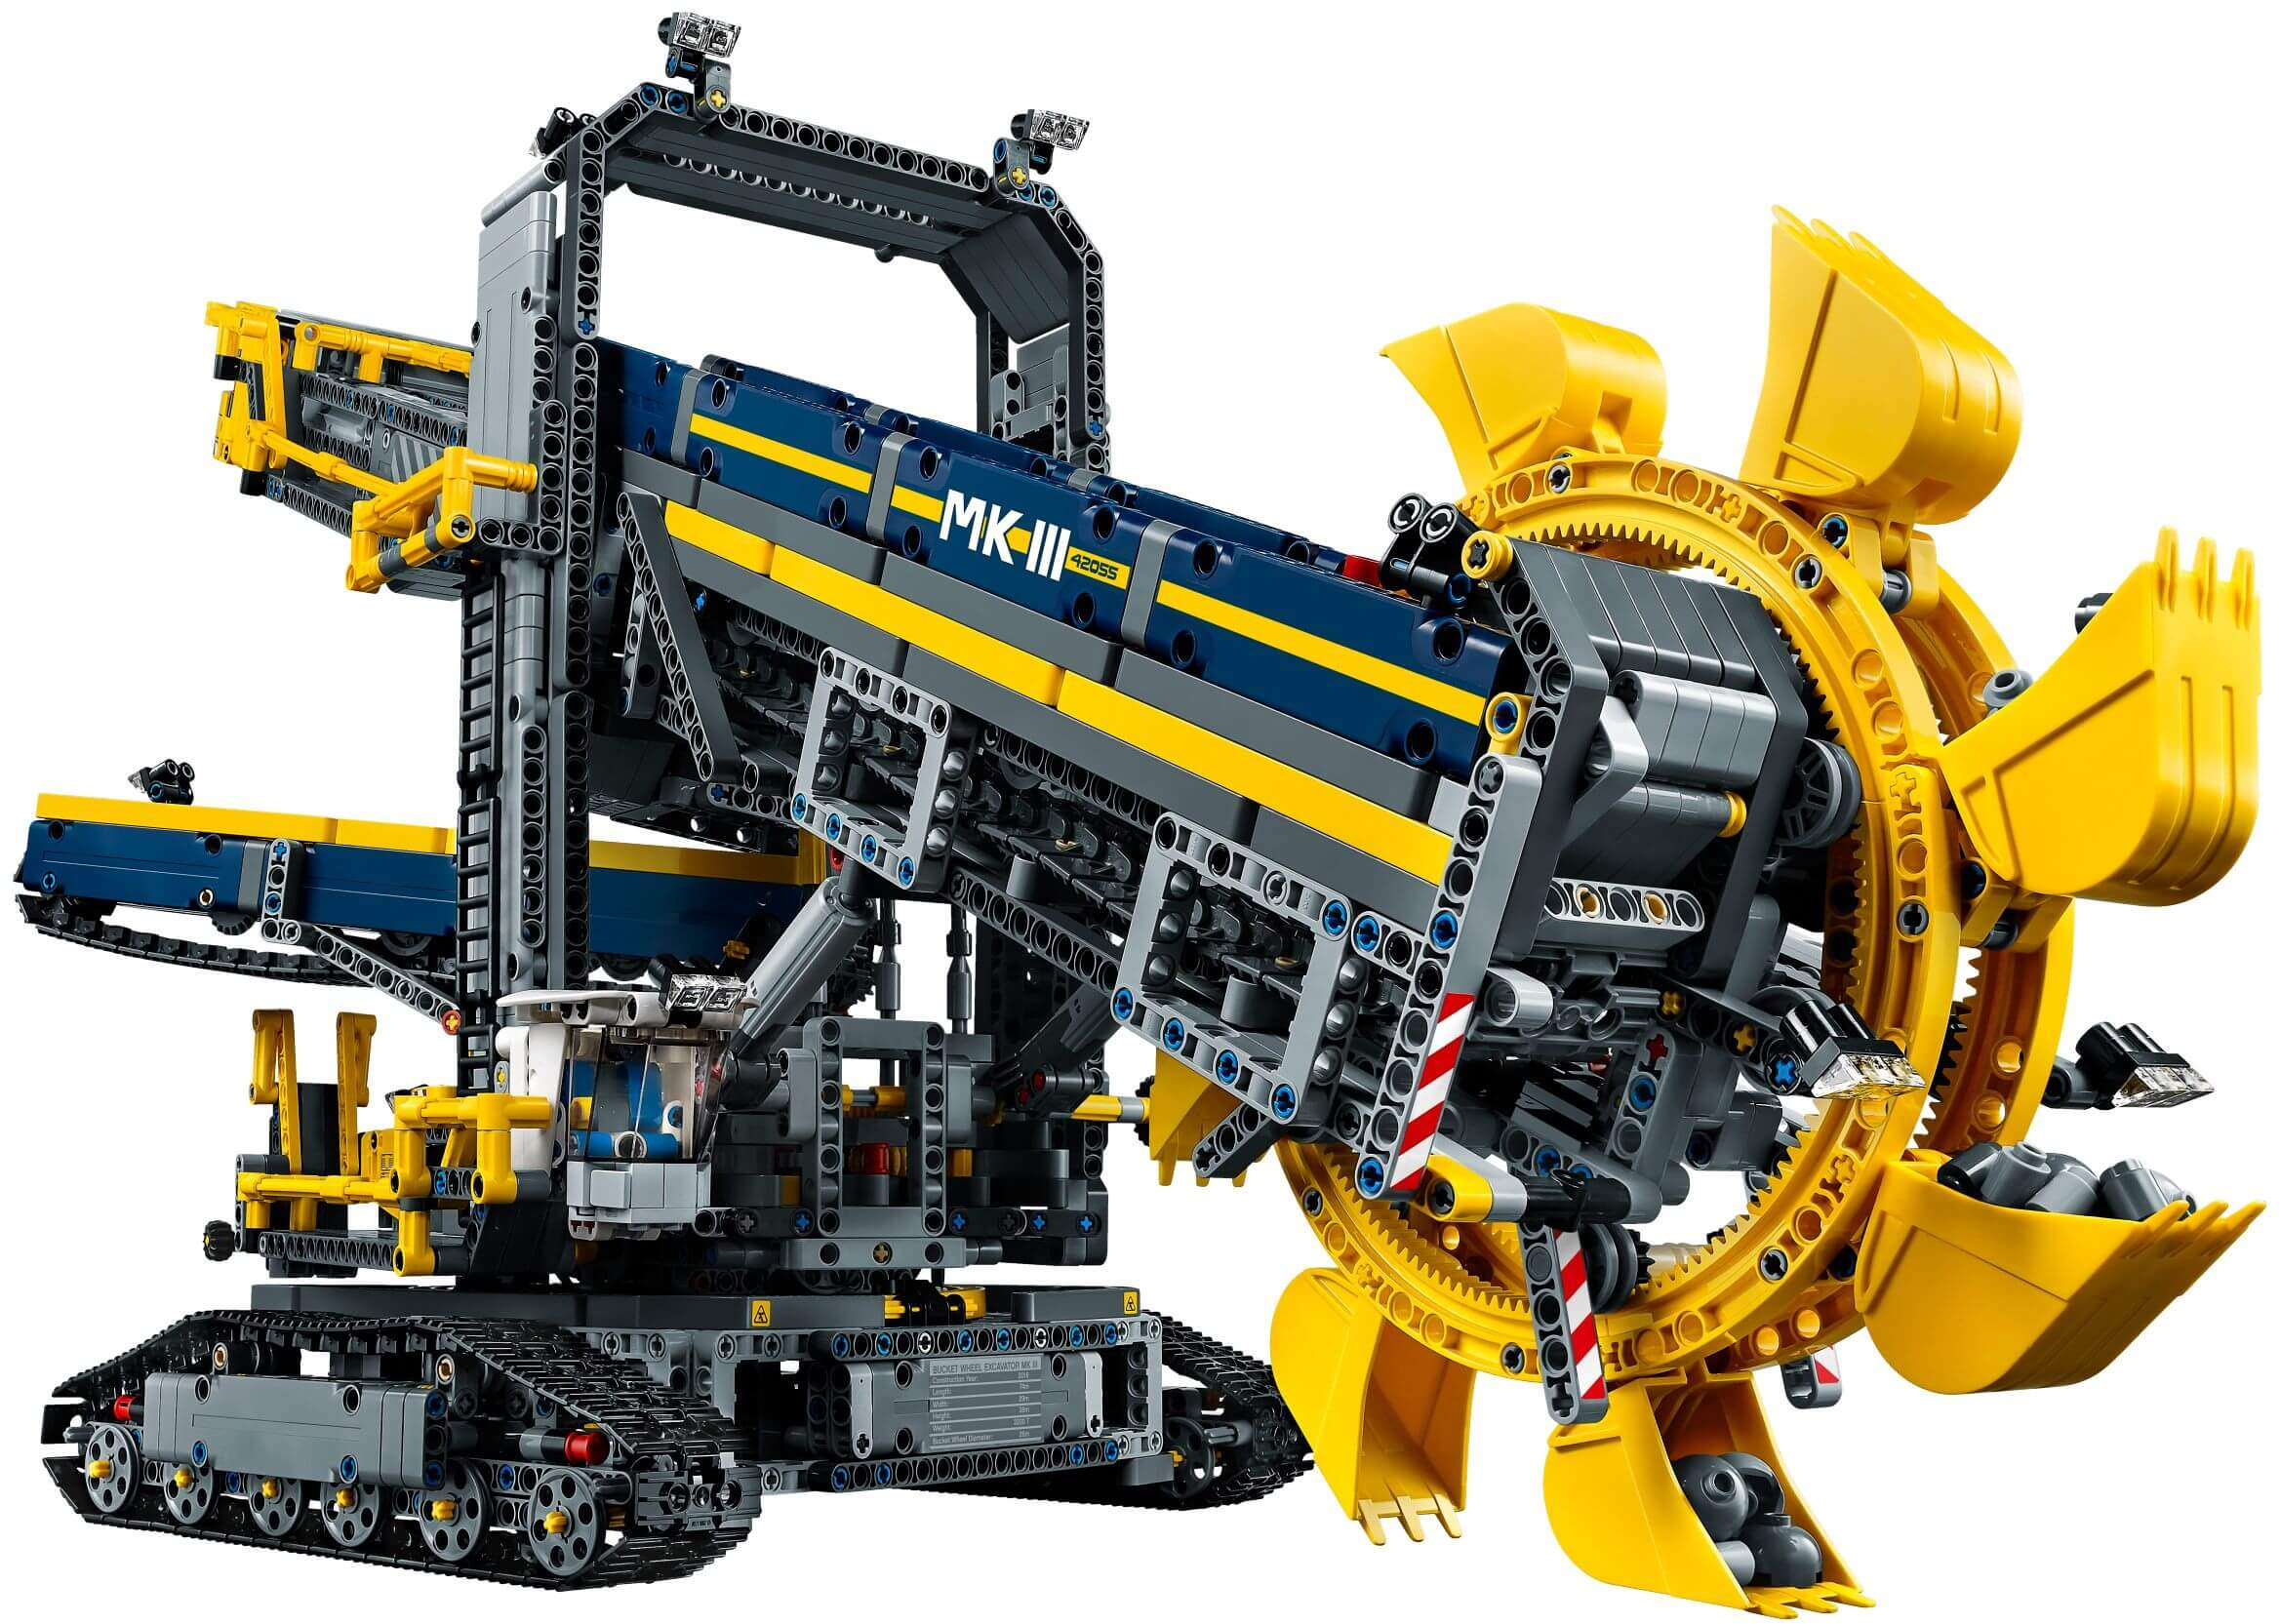 Mua đồ chơi LEGO 42055 - LEGO Technic 42055 - Máy Đào Đất Khổng Lồ (LEGO Technic Bucket Wheel Excavator 42055)